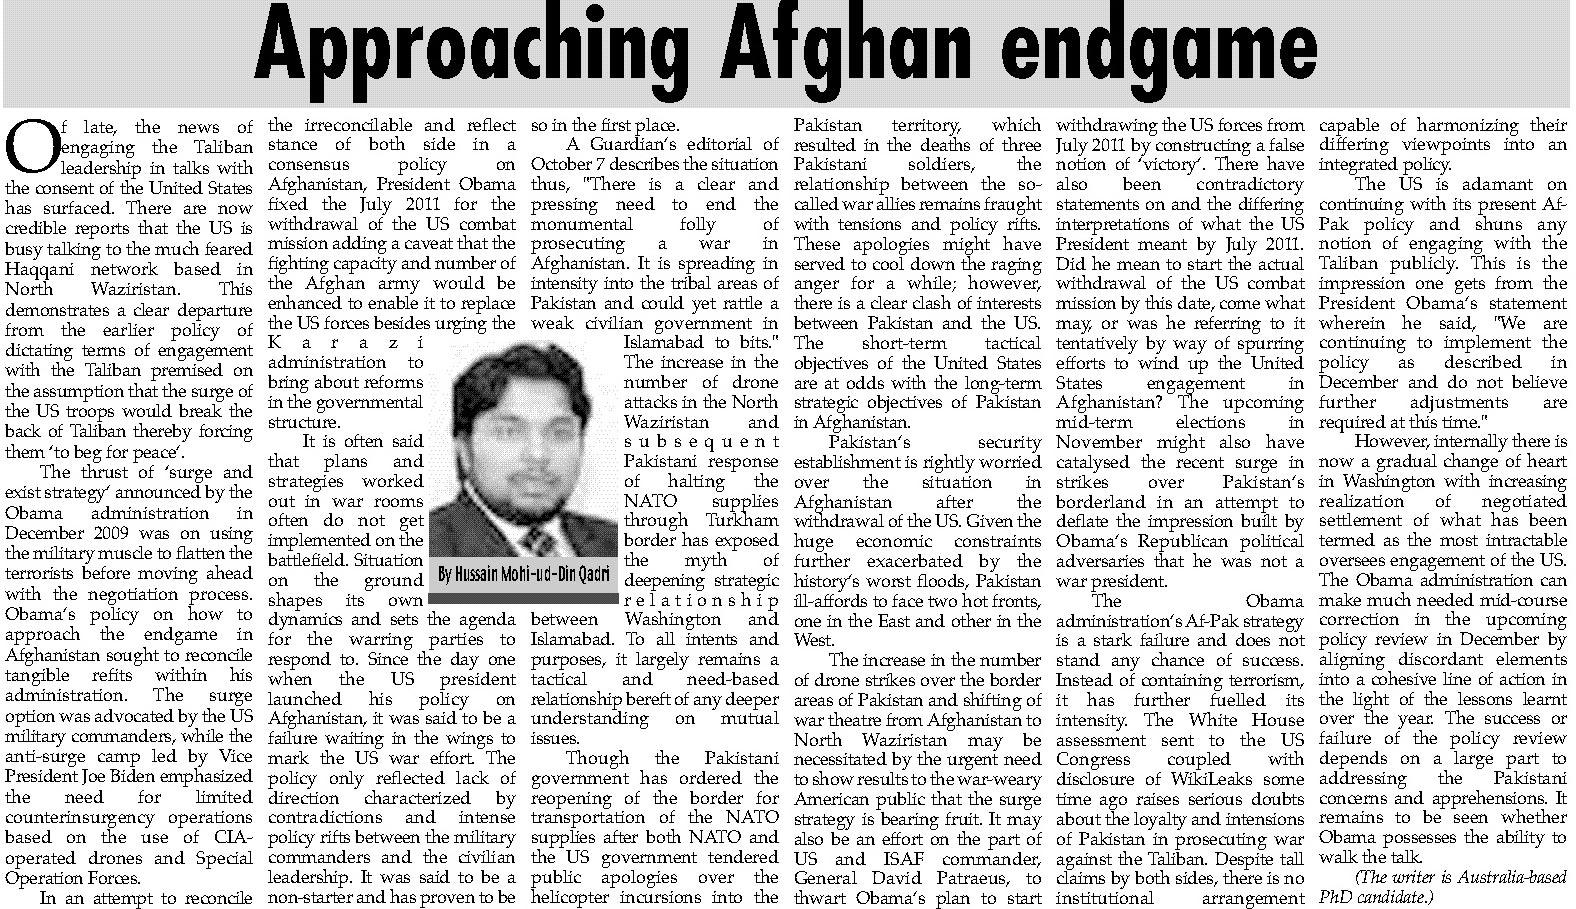 تحریک منہاج القرآن Minhaj-ul-Quran  Print Media Coverage پرنٹ میڈیا کوریج The Nation London Page: 17